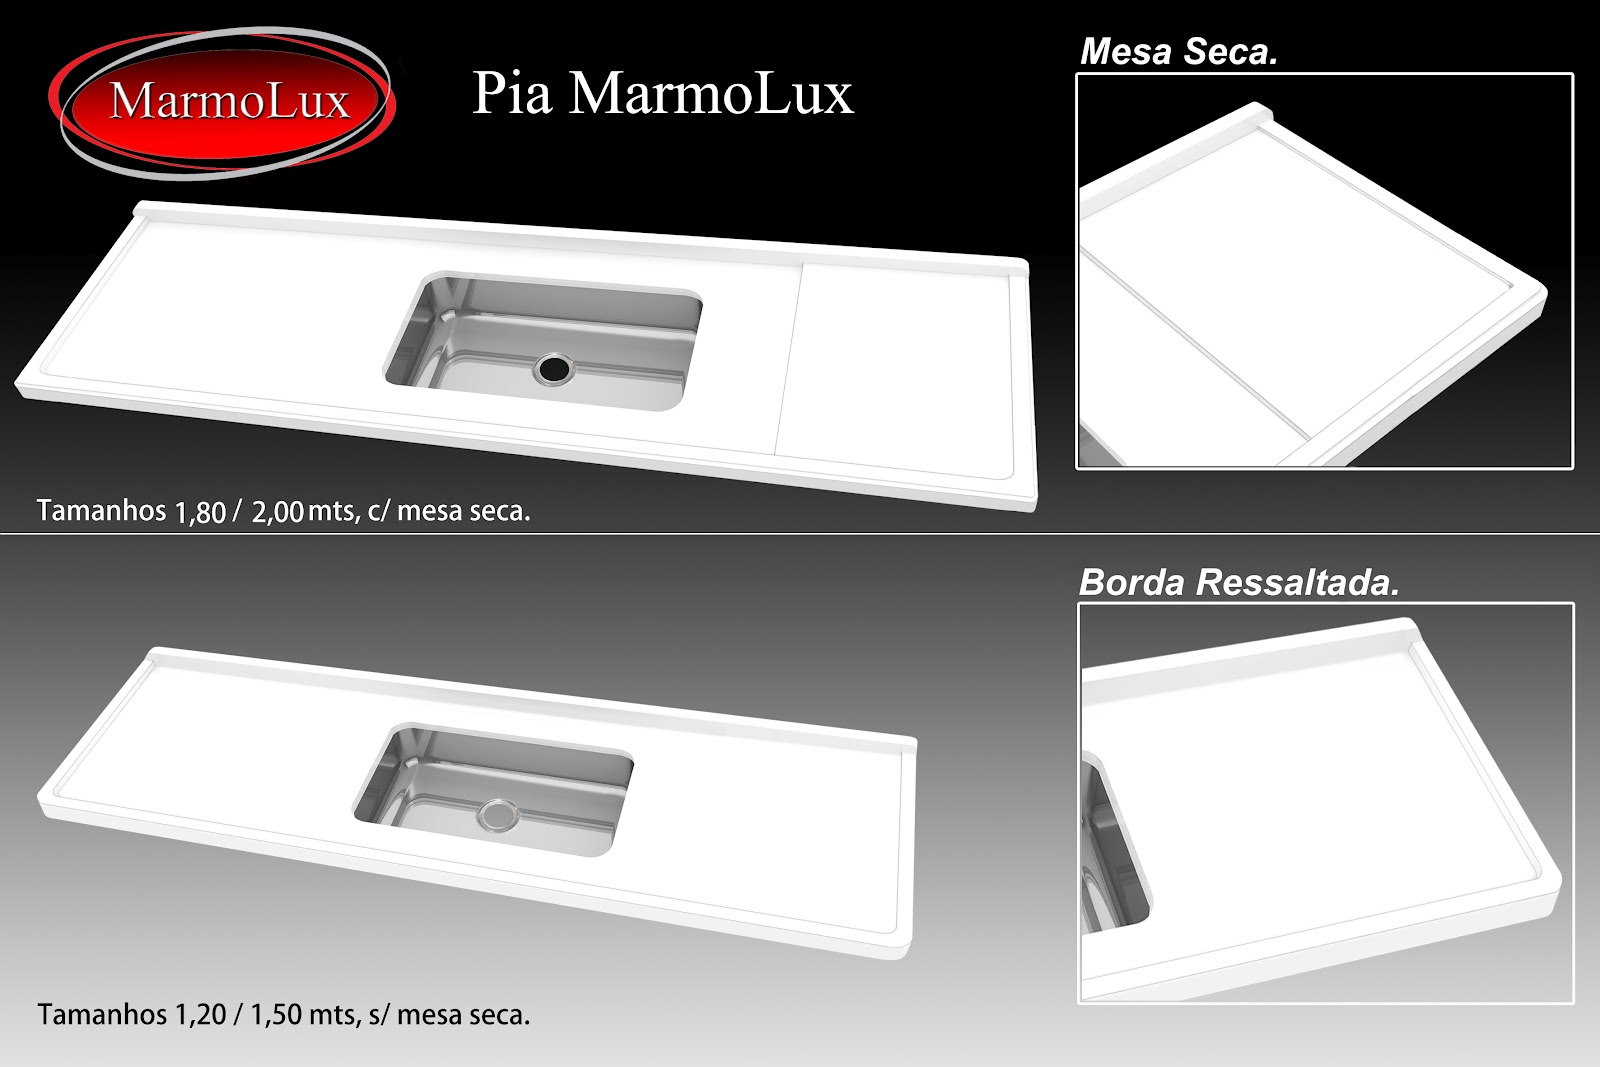 Hipi: Pia Marmolux #C30809 1600 1067